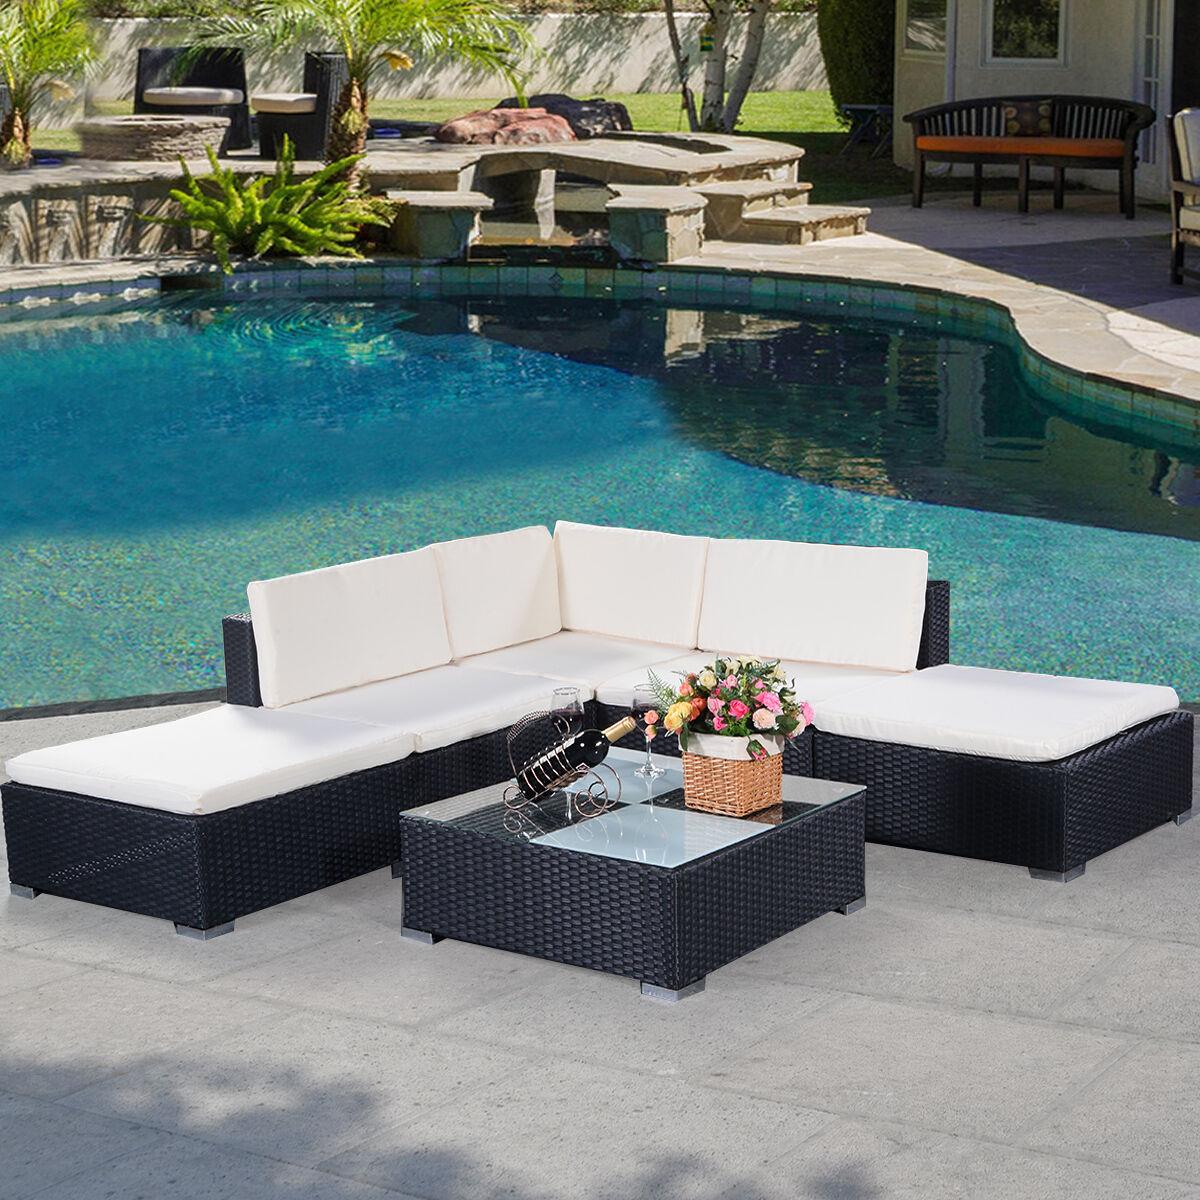 Garden Furniture - 6PC Rattan Outdoor Garden Furniture Patio Corner Sofa Set PE Wicker Steel Fram